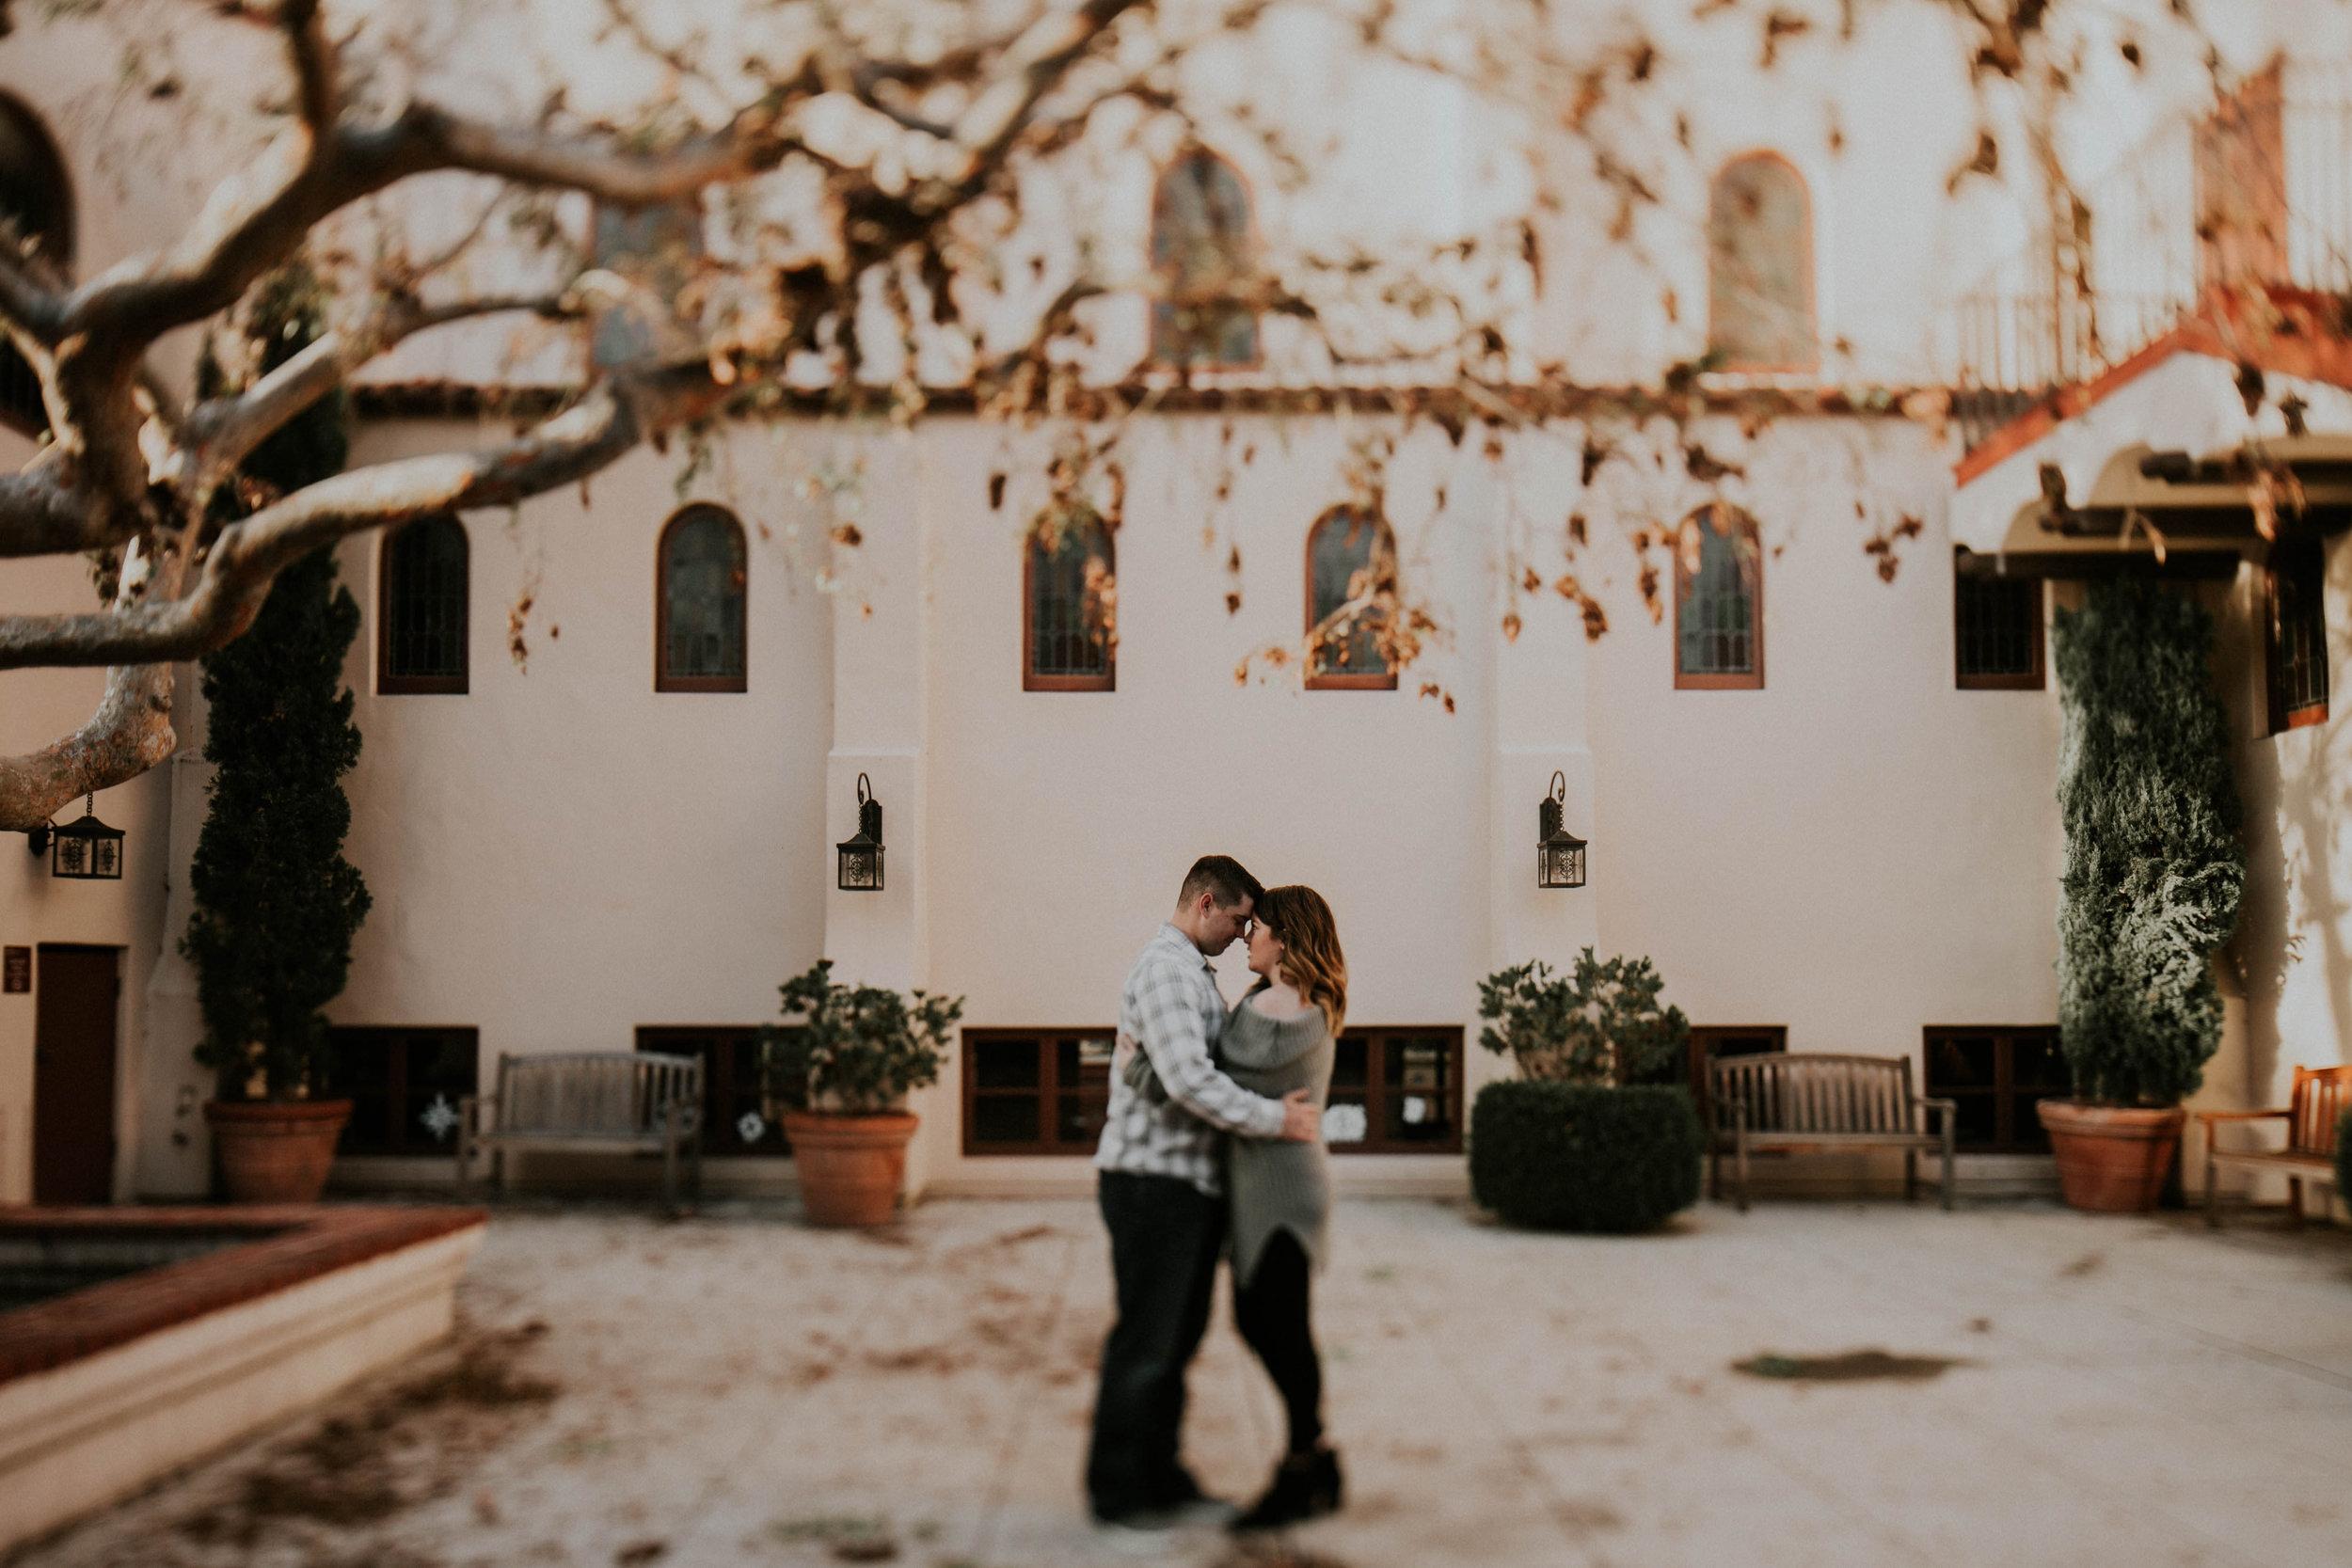 Laguna Beach Engagement Photos Kate and Curtis Grace E. Jones Photography31.jpg